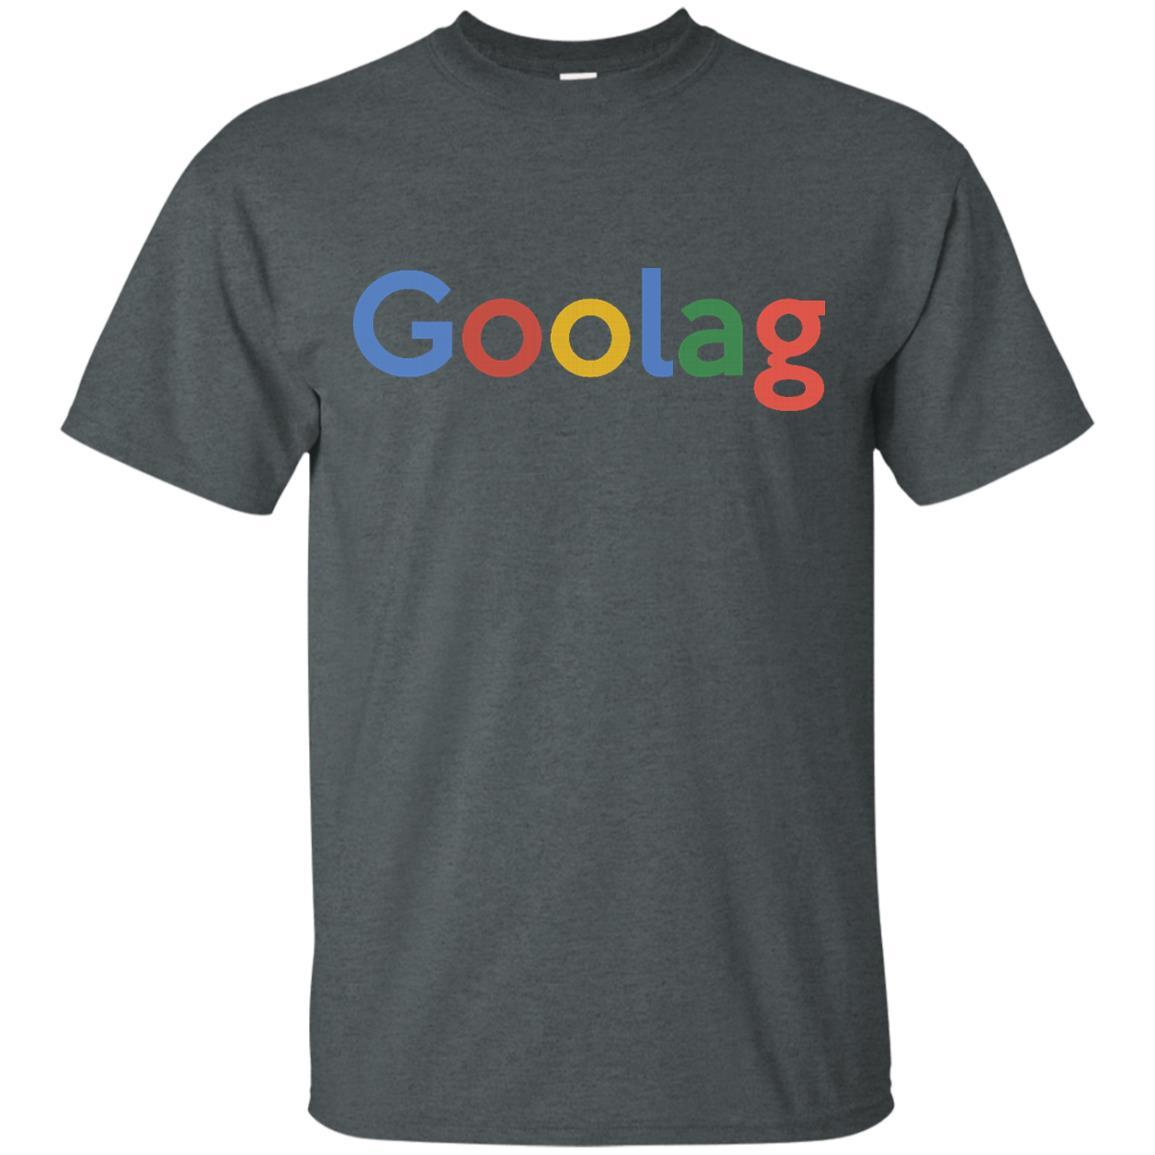 image 282px Googlag T Shirt, Hoodies, Tank Top